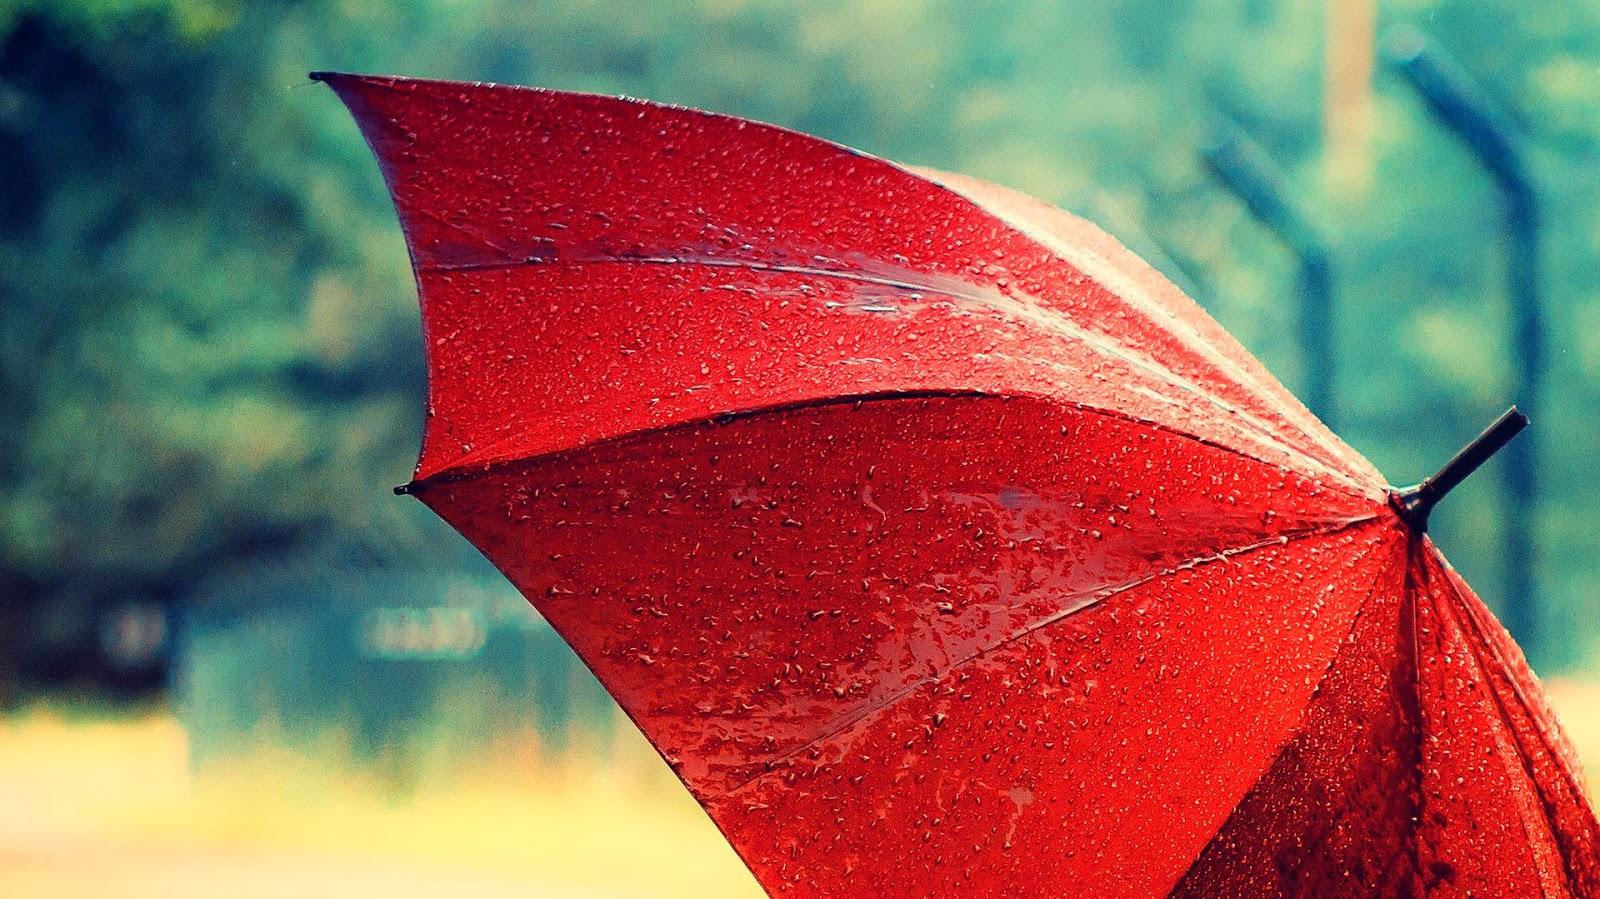 Popular Wallpaper Love Rain - in_rain_with_red_umbrella-HD  HD_884160.jpg